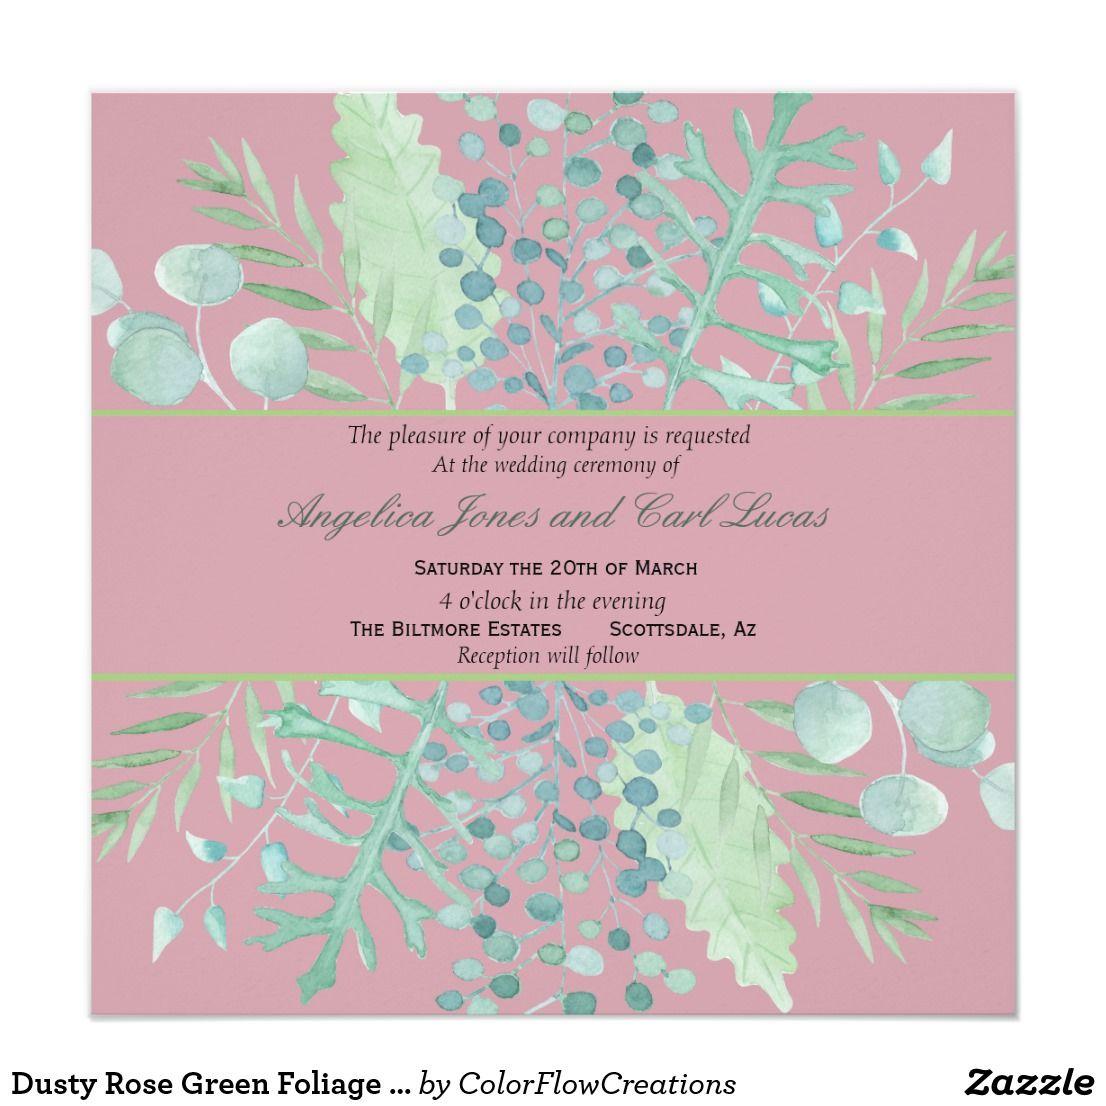 Dusty Rose Green Foliage Leaves Wedding Invitation - Pink Wedding ...